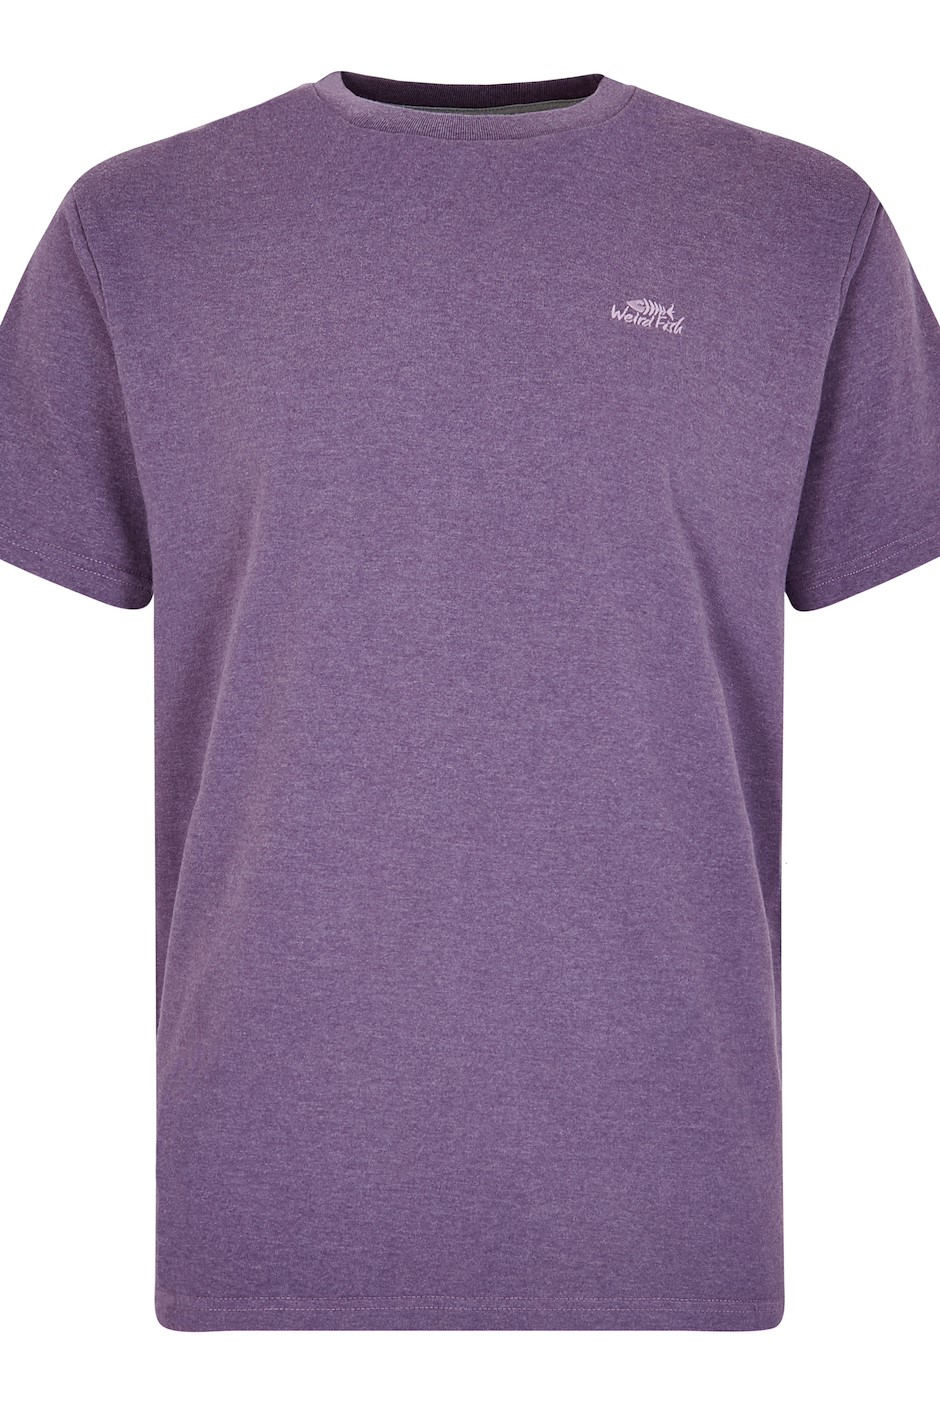 Fished Plain Branded T-Shirt Light Grape Marl